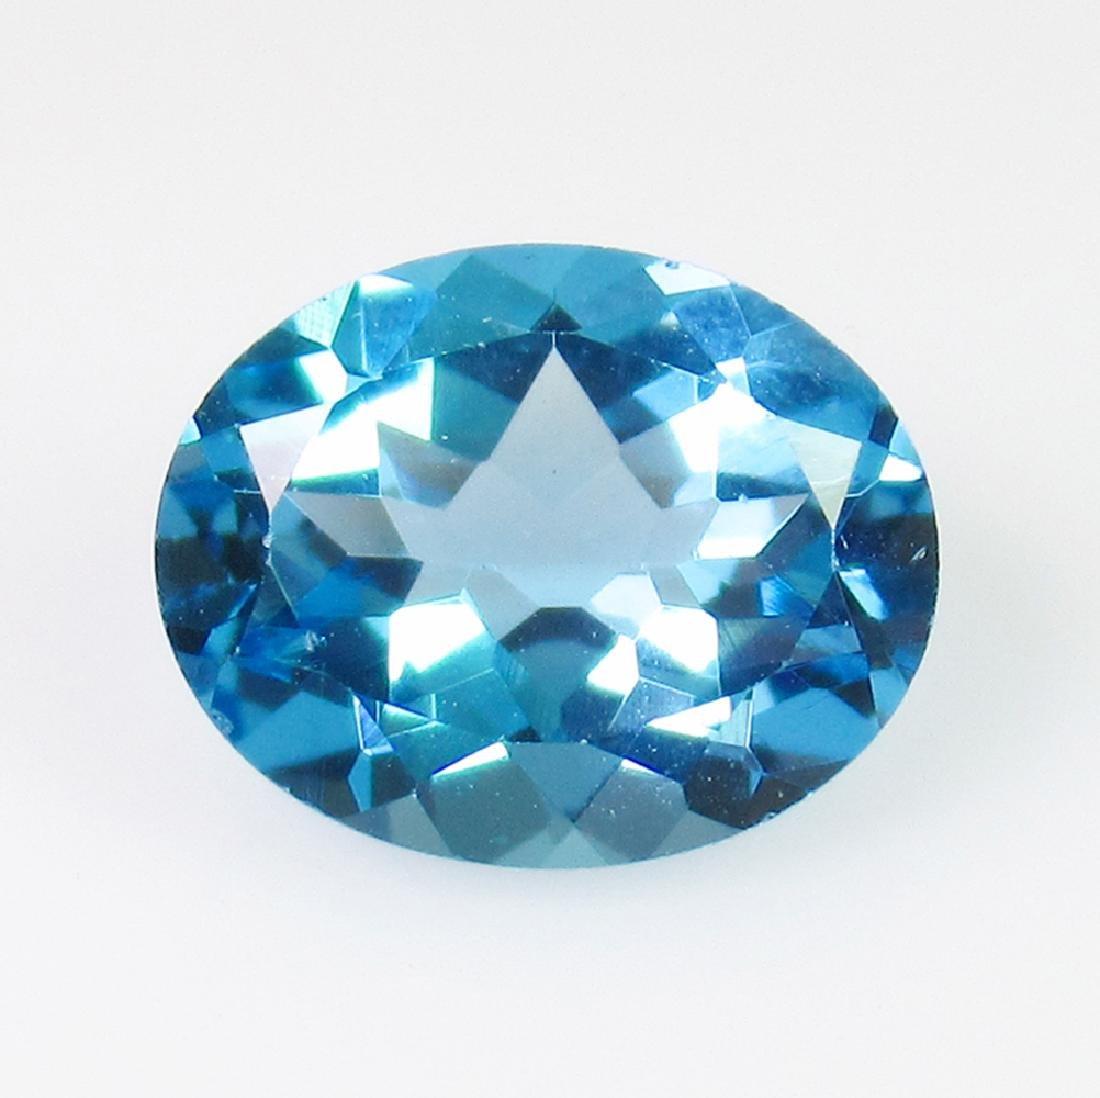 2.79 Ct Genuine Swiss Blue Topaz 10X8 mm Oval Cut